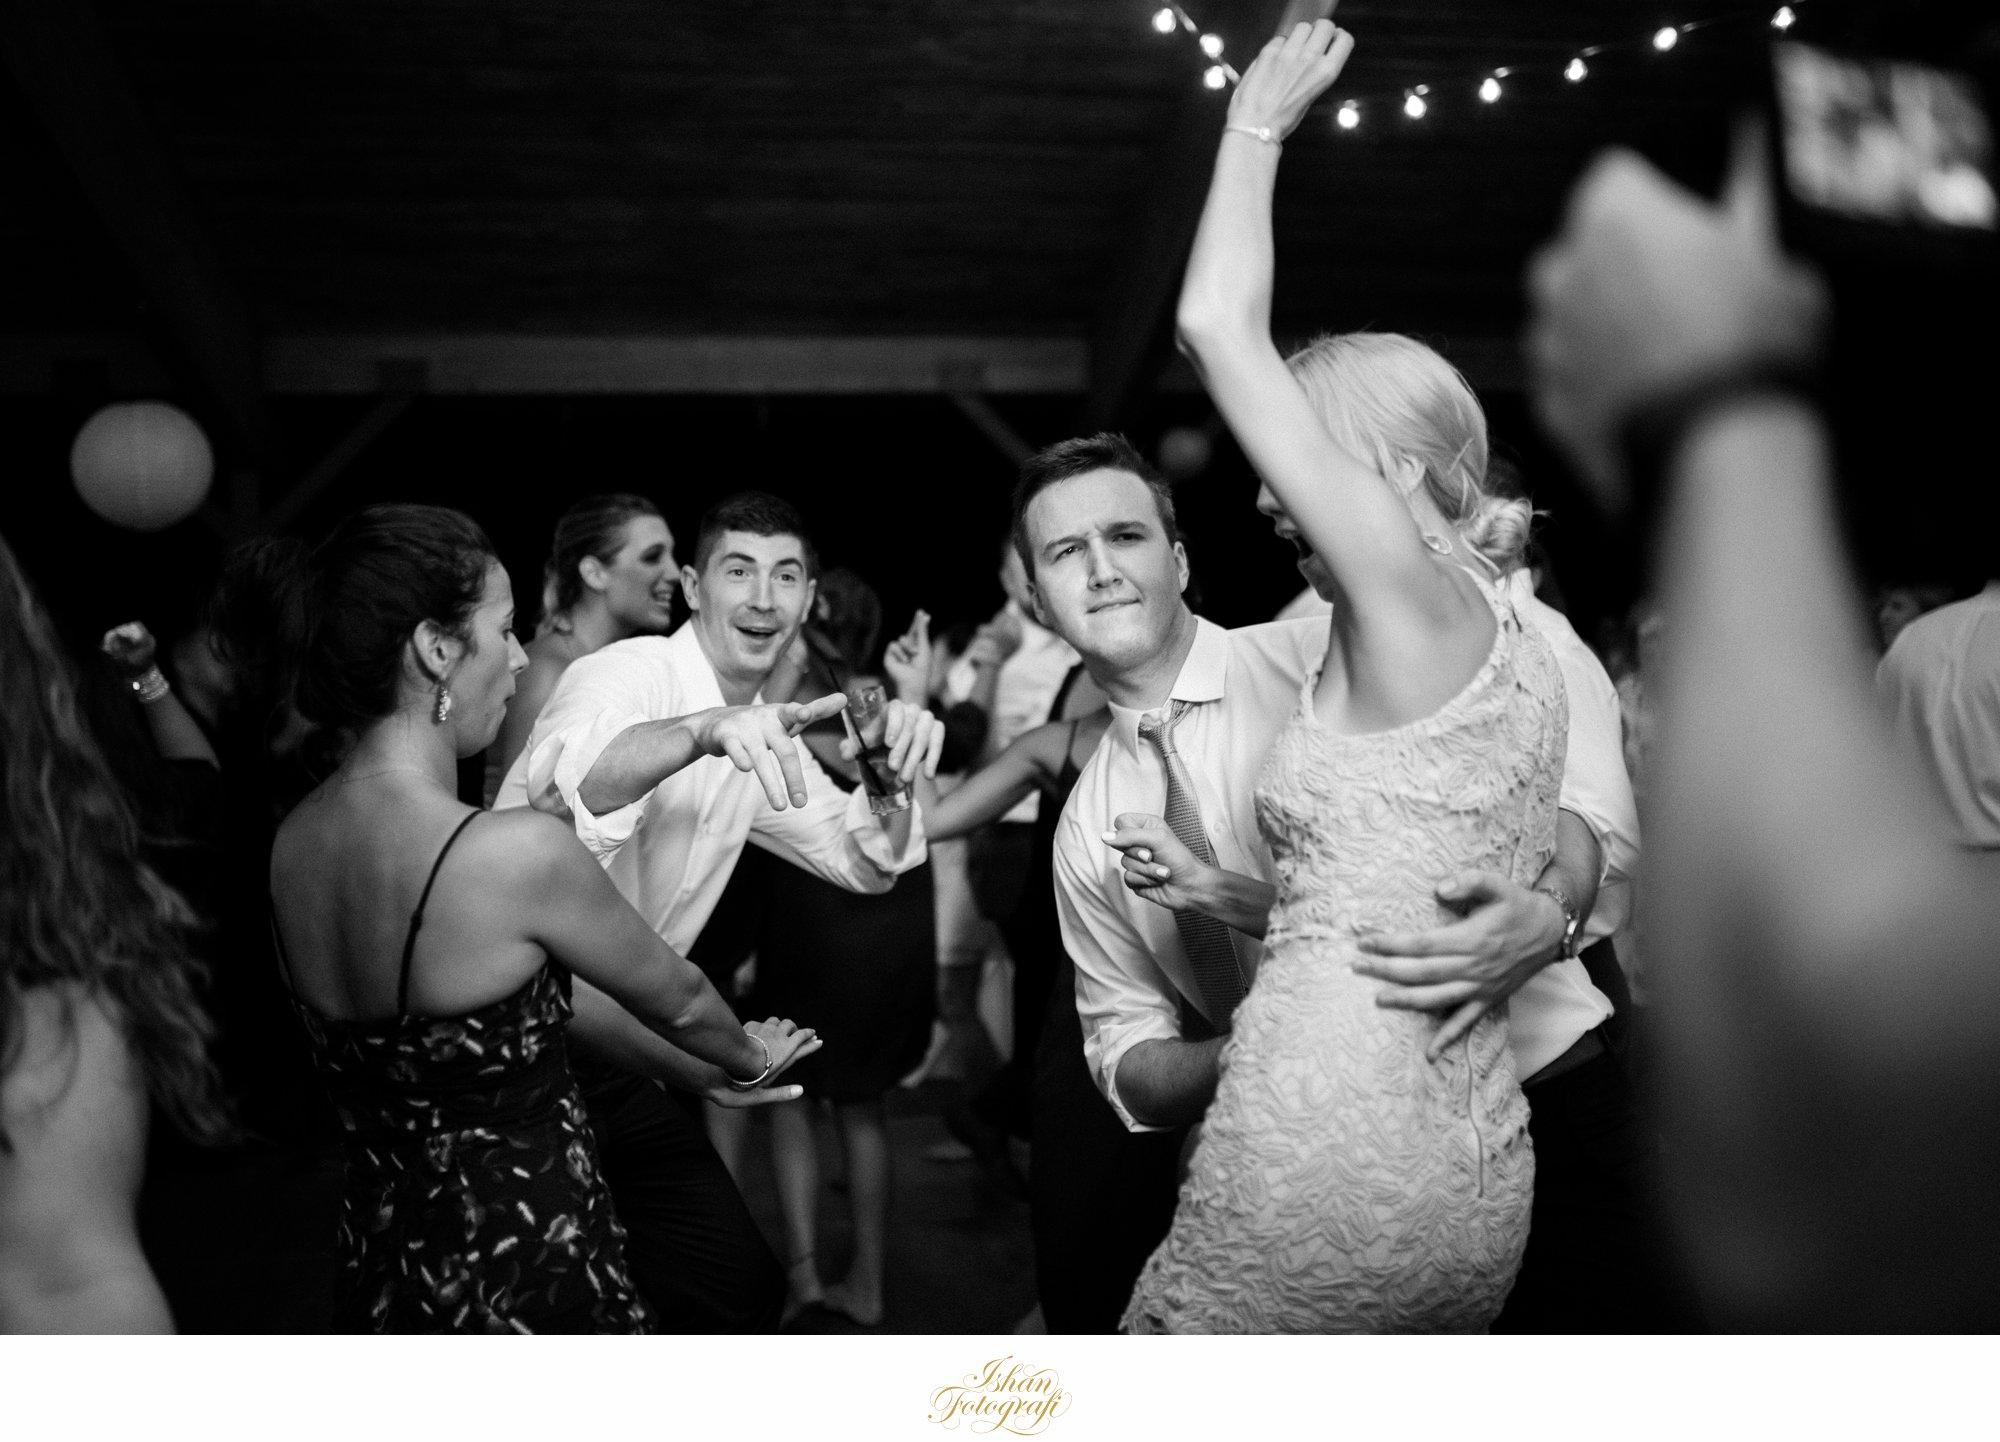 minerals-resort-and-spa-wedding-photos-hamburg-nj